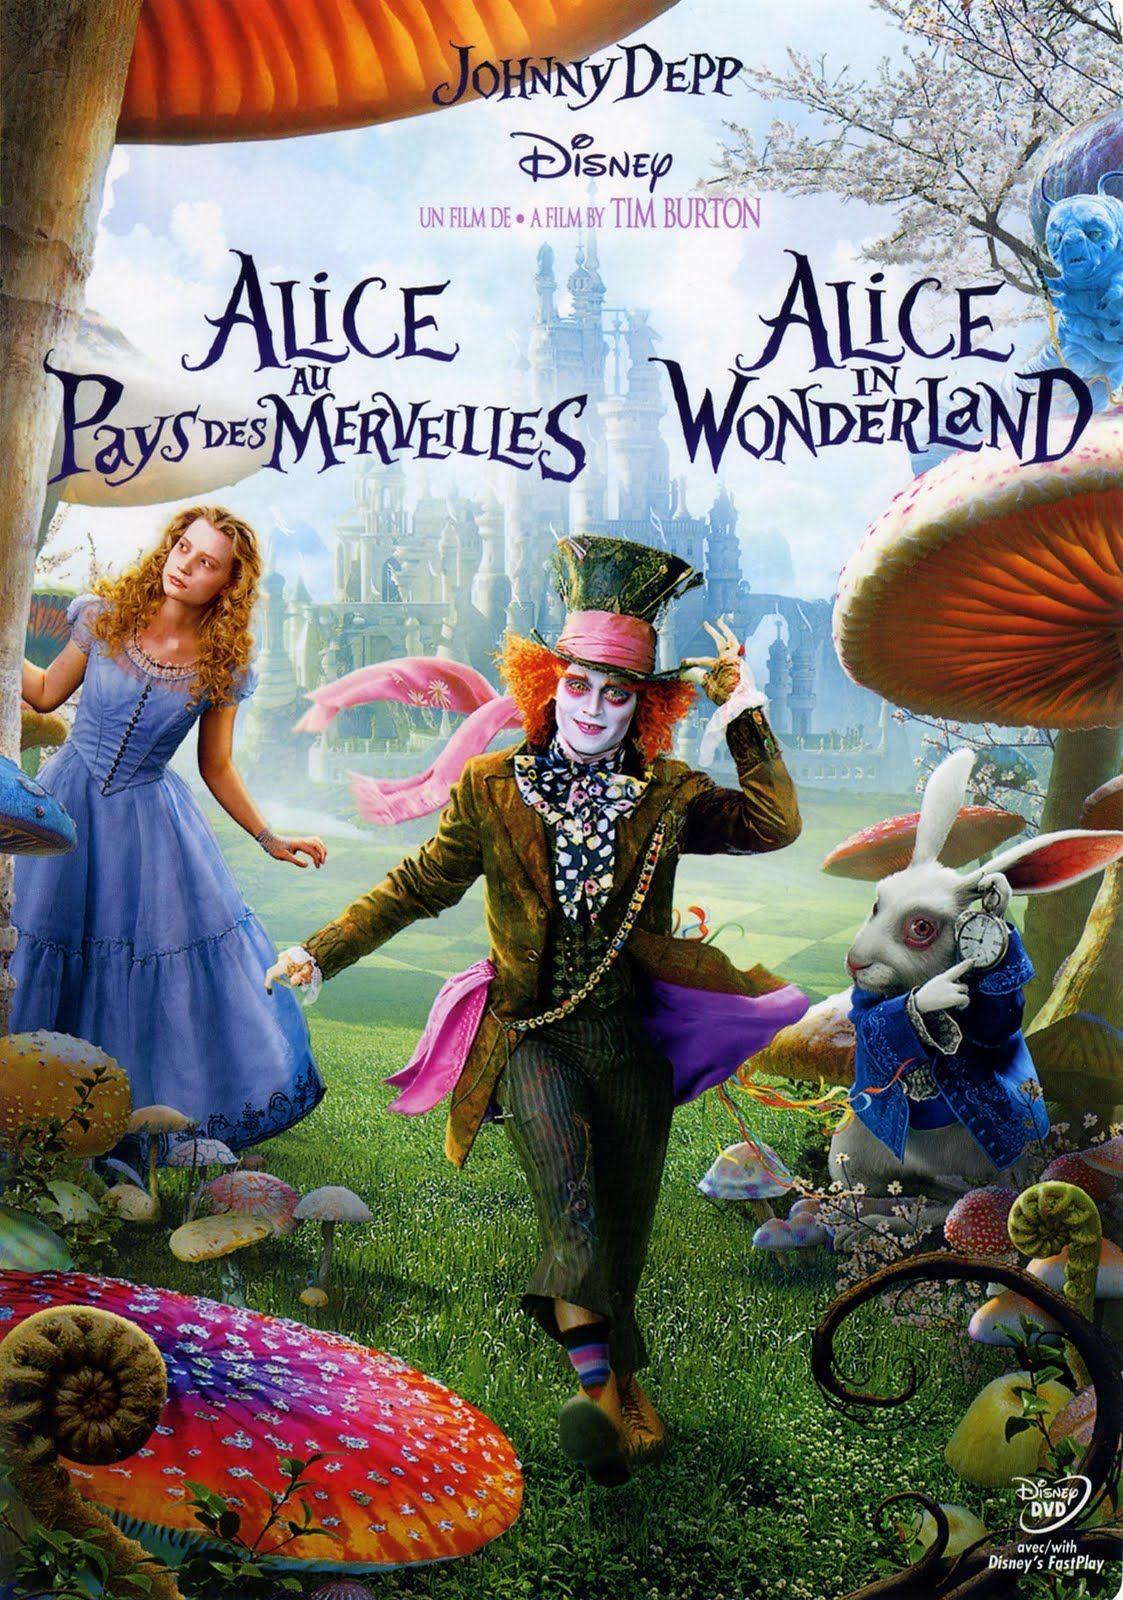 Disneysoul Com Disney Alice Adventures In Wonderland Johnny Depp